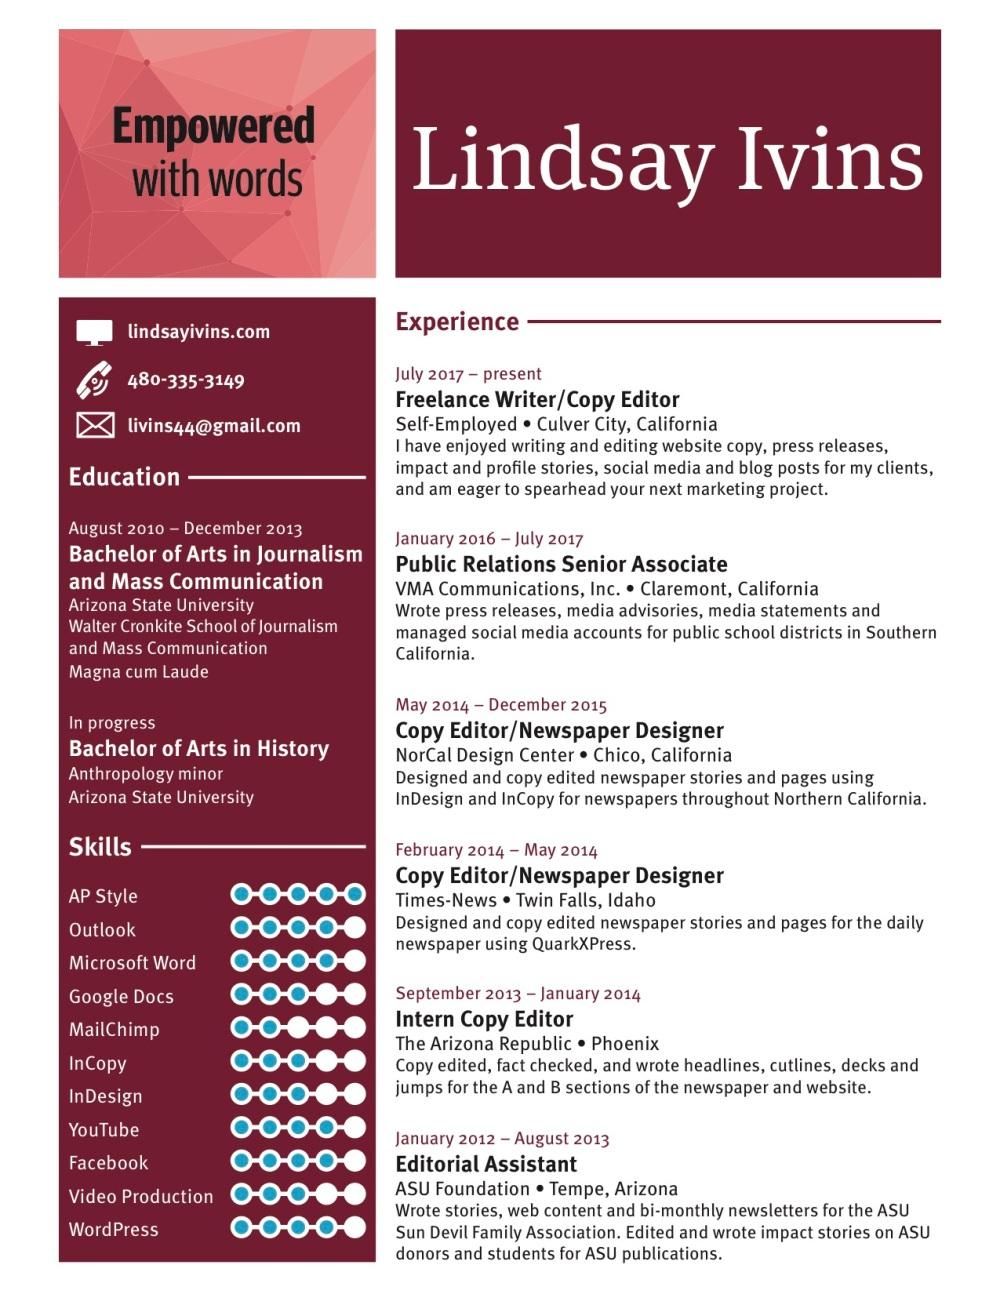 Resume Lindsay Ivins